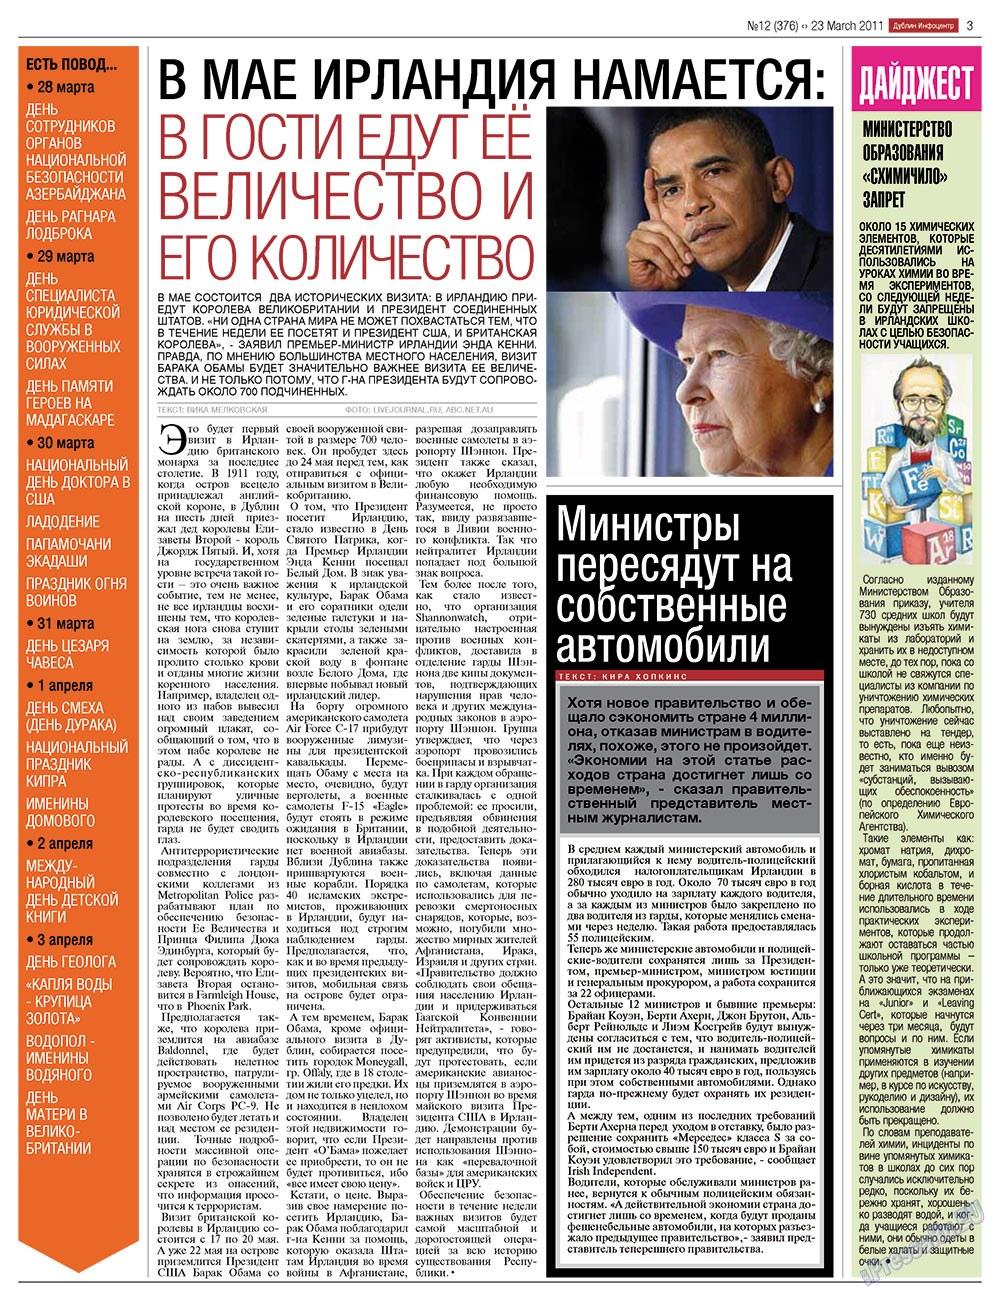 Дублин инфоцентр (газета). 2011 год, номер 12, стр. 3